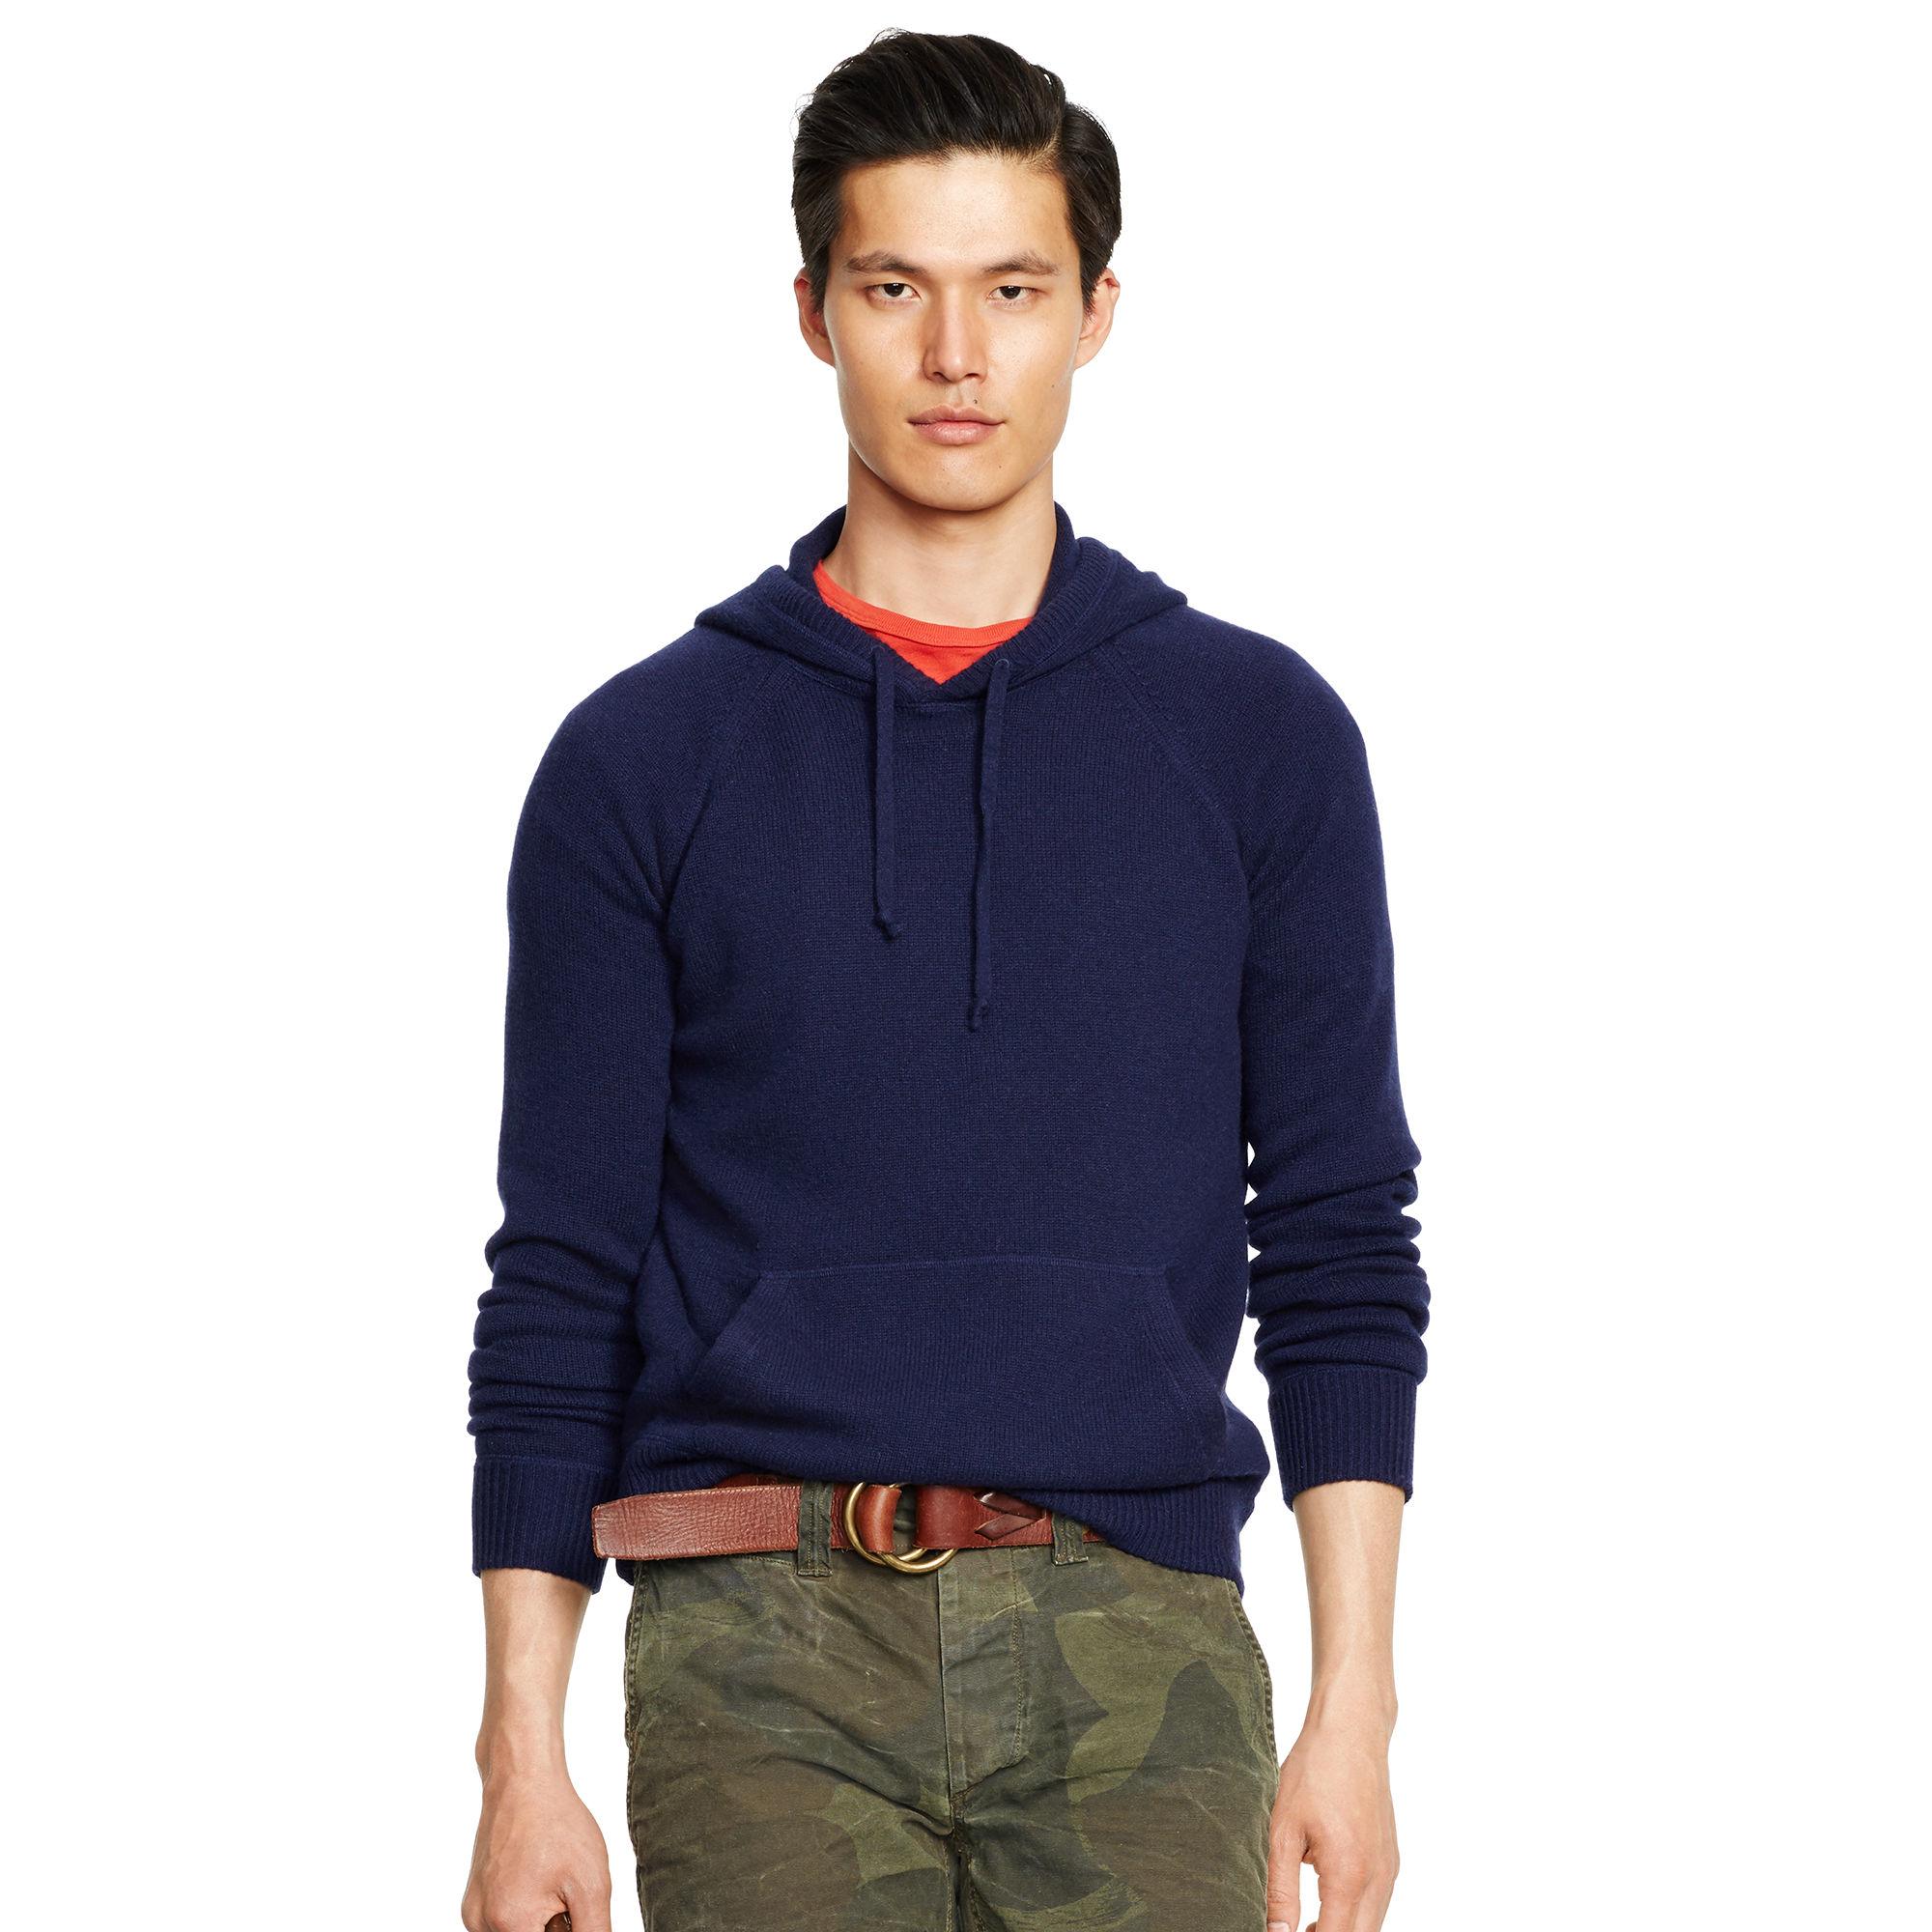 polo ralph lauren cashmere hoodie in blue for men lyst. Black Bedroom Furniture Sets. Home Design Ideas